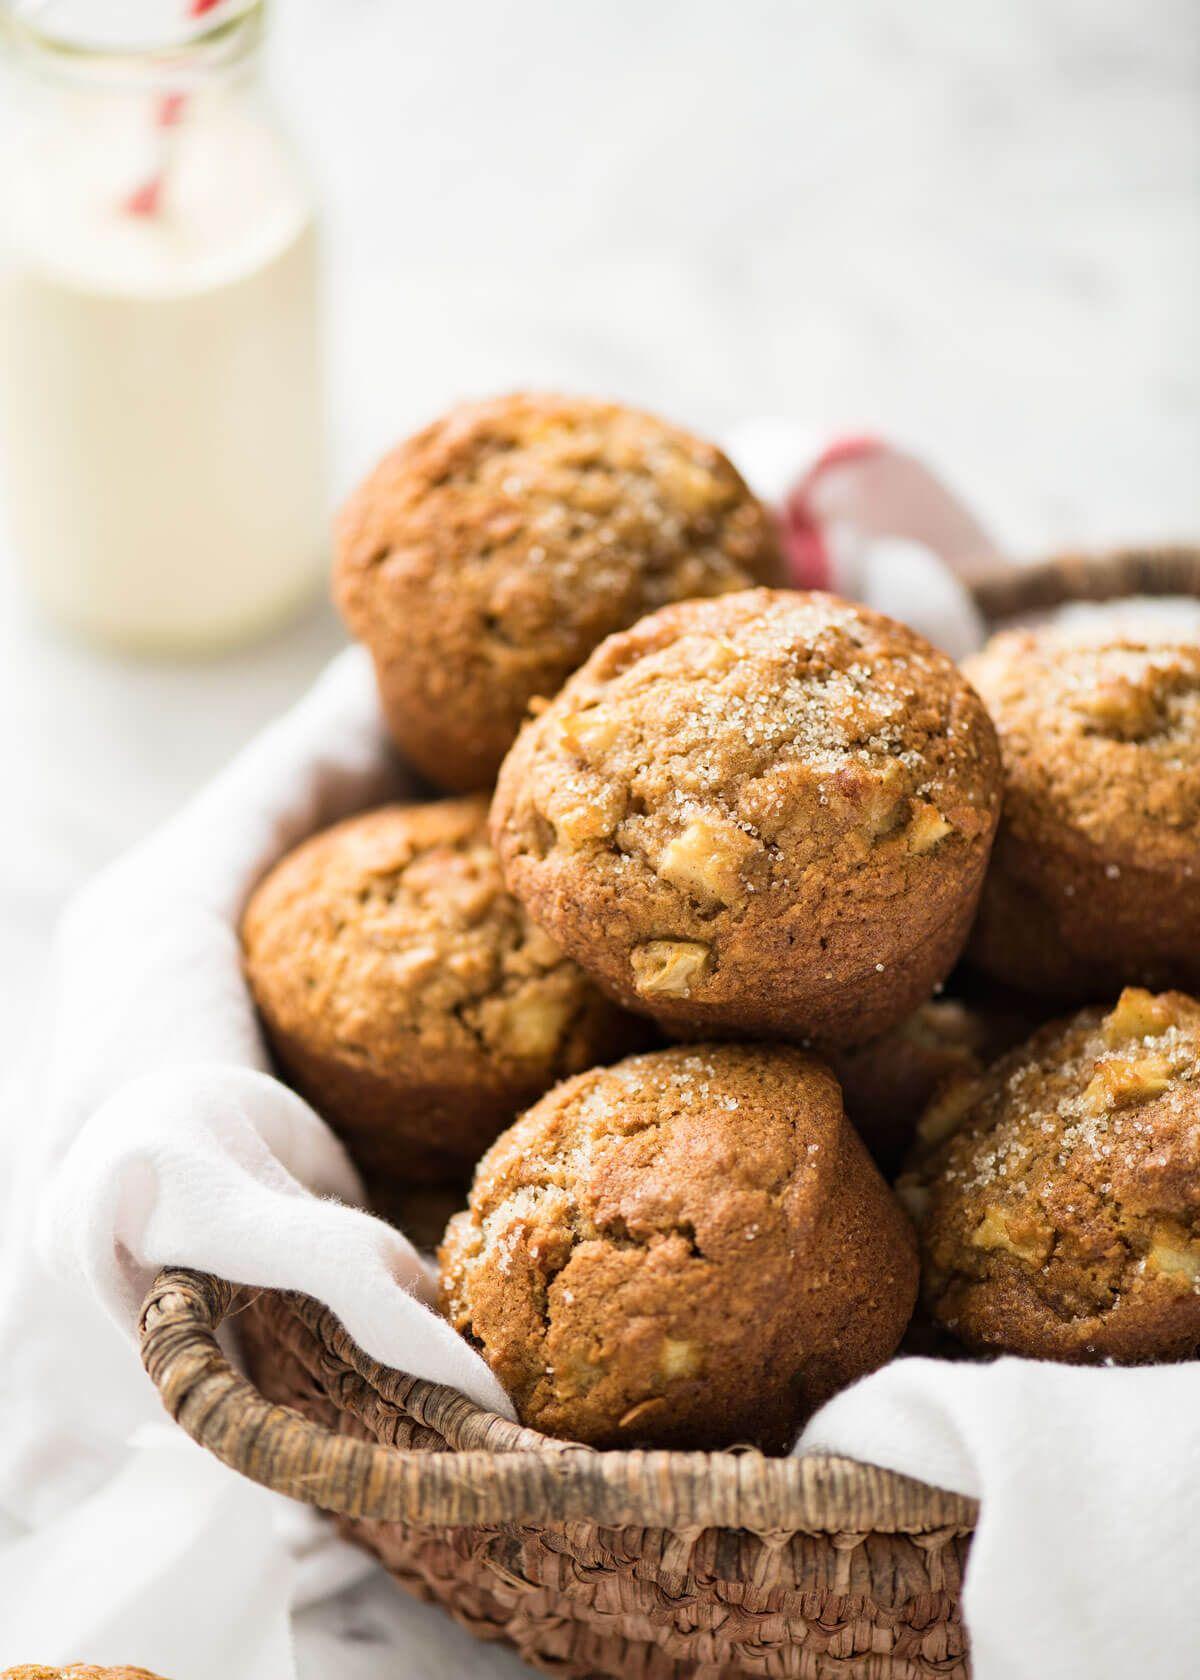 Magic Stay Moist Apple Muffins Recipe Apple Muffins Recipetin Eats Sugar Apples